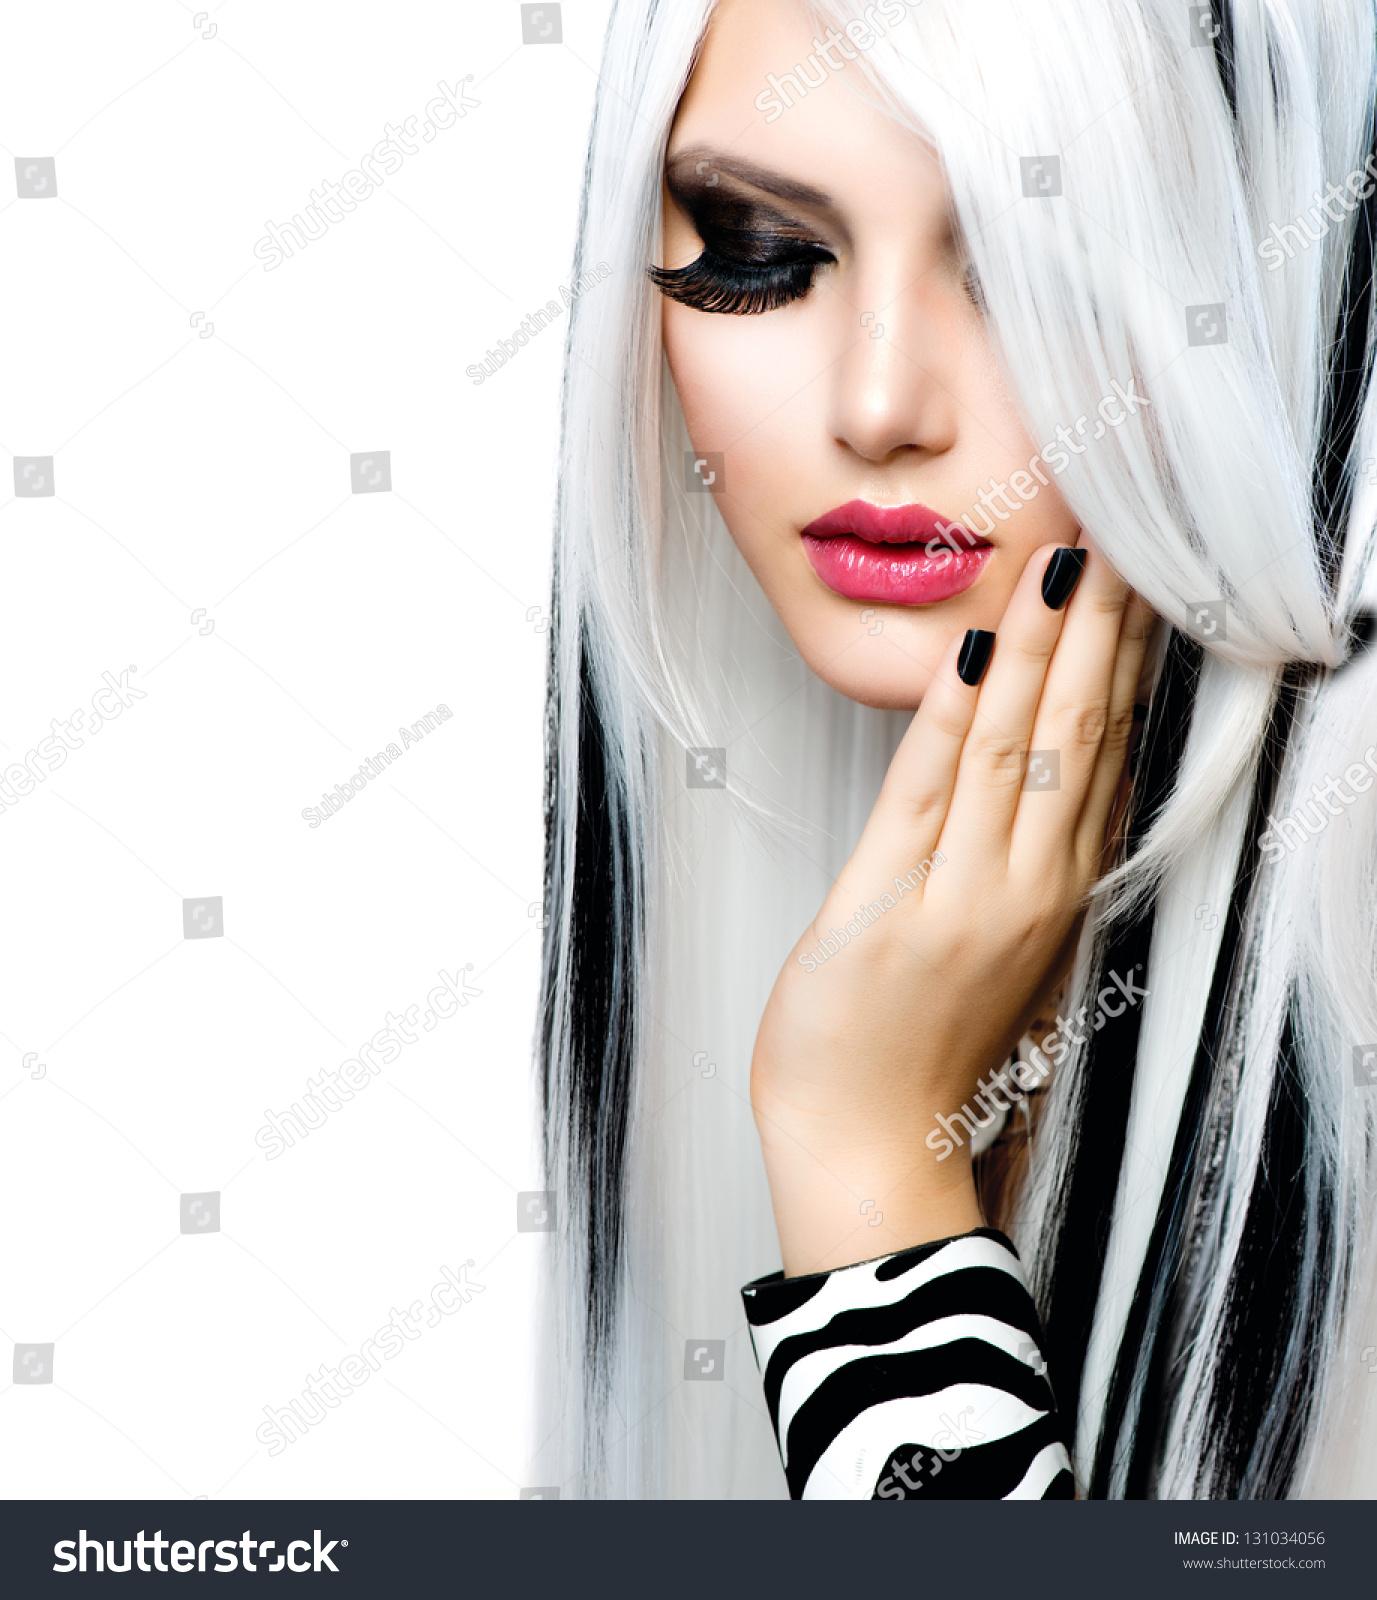 Beauty Fashion Girl Black White Style Stock Photo 131034056 Shutterstock